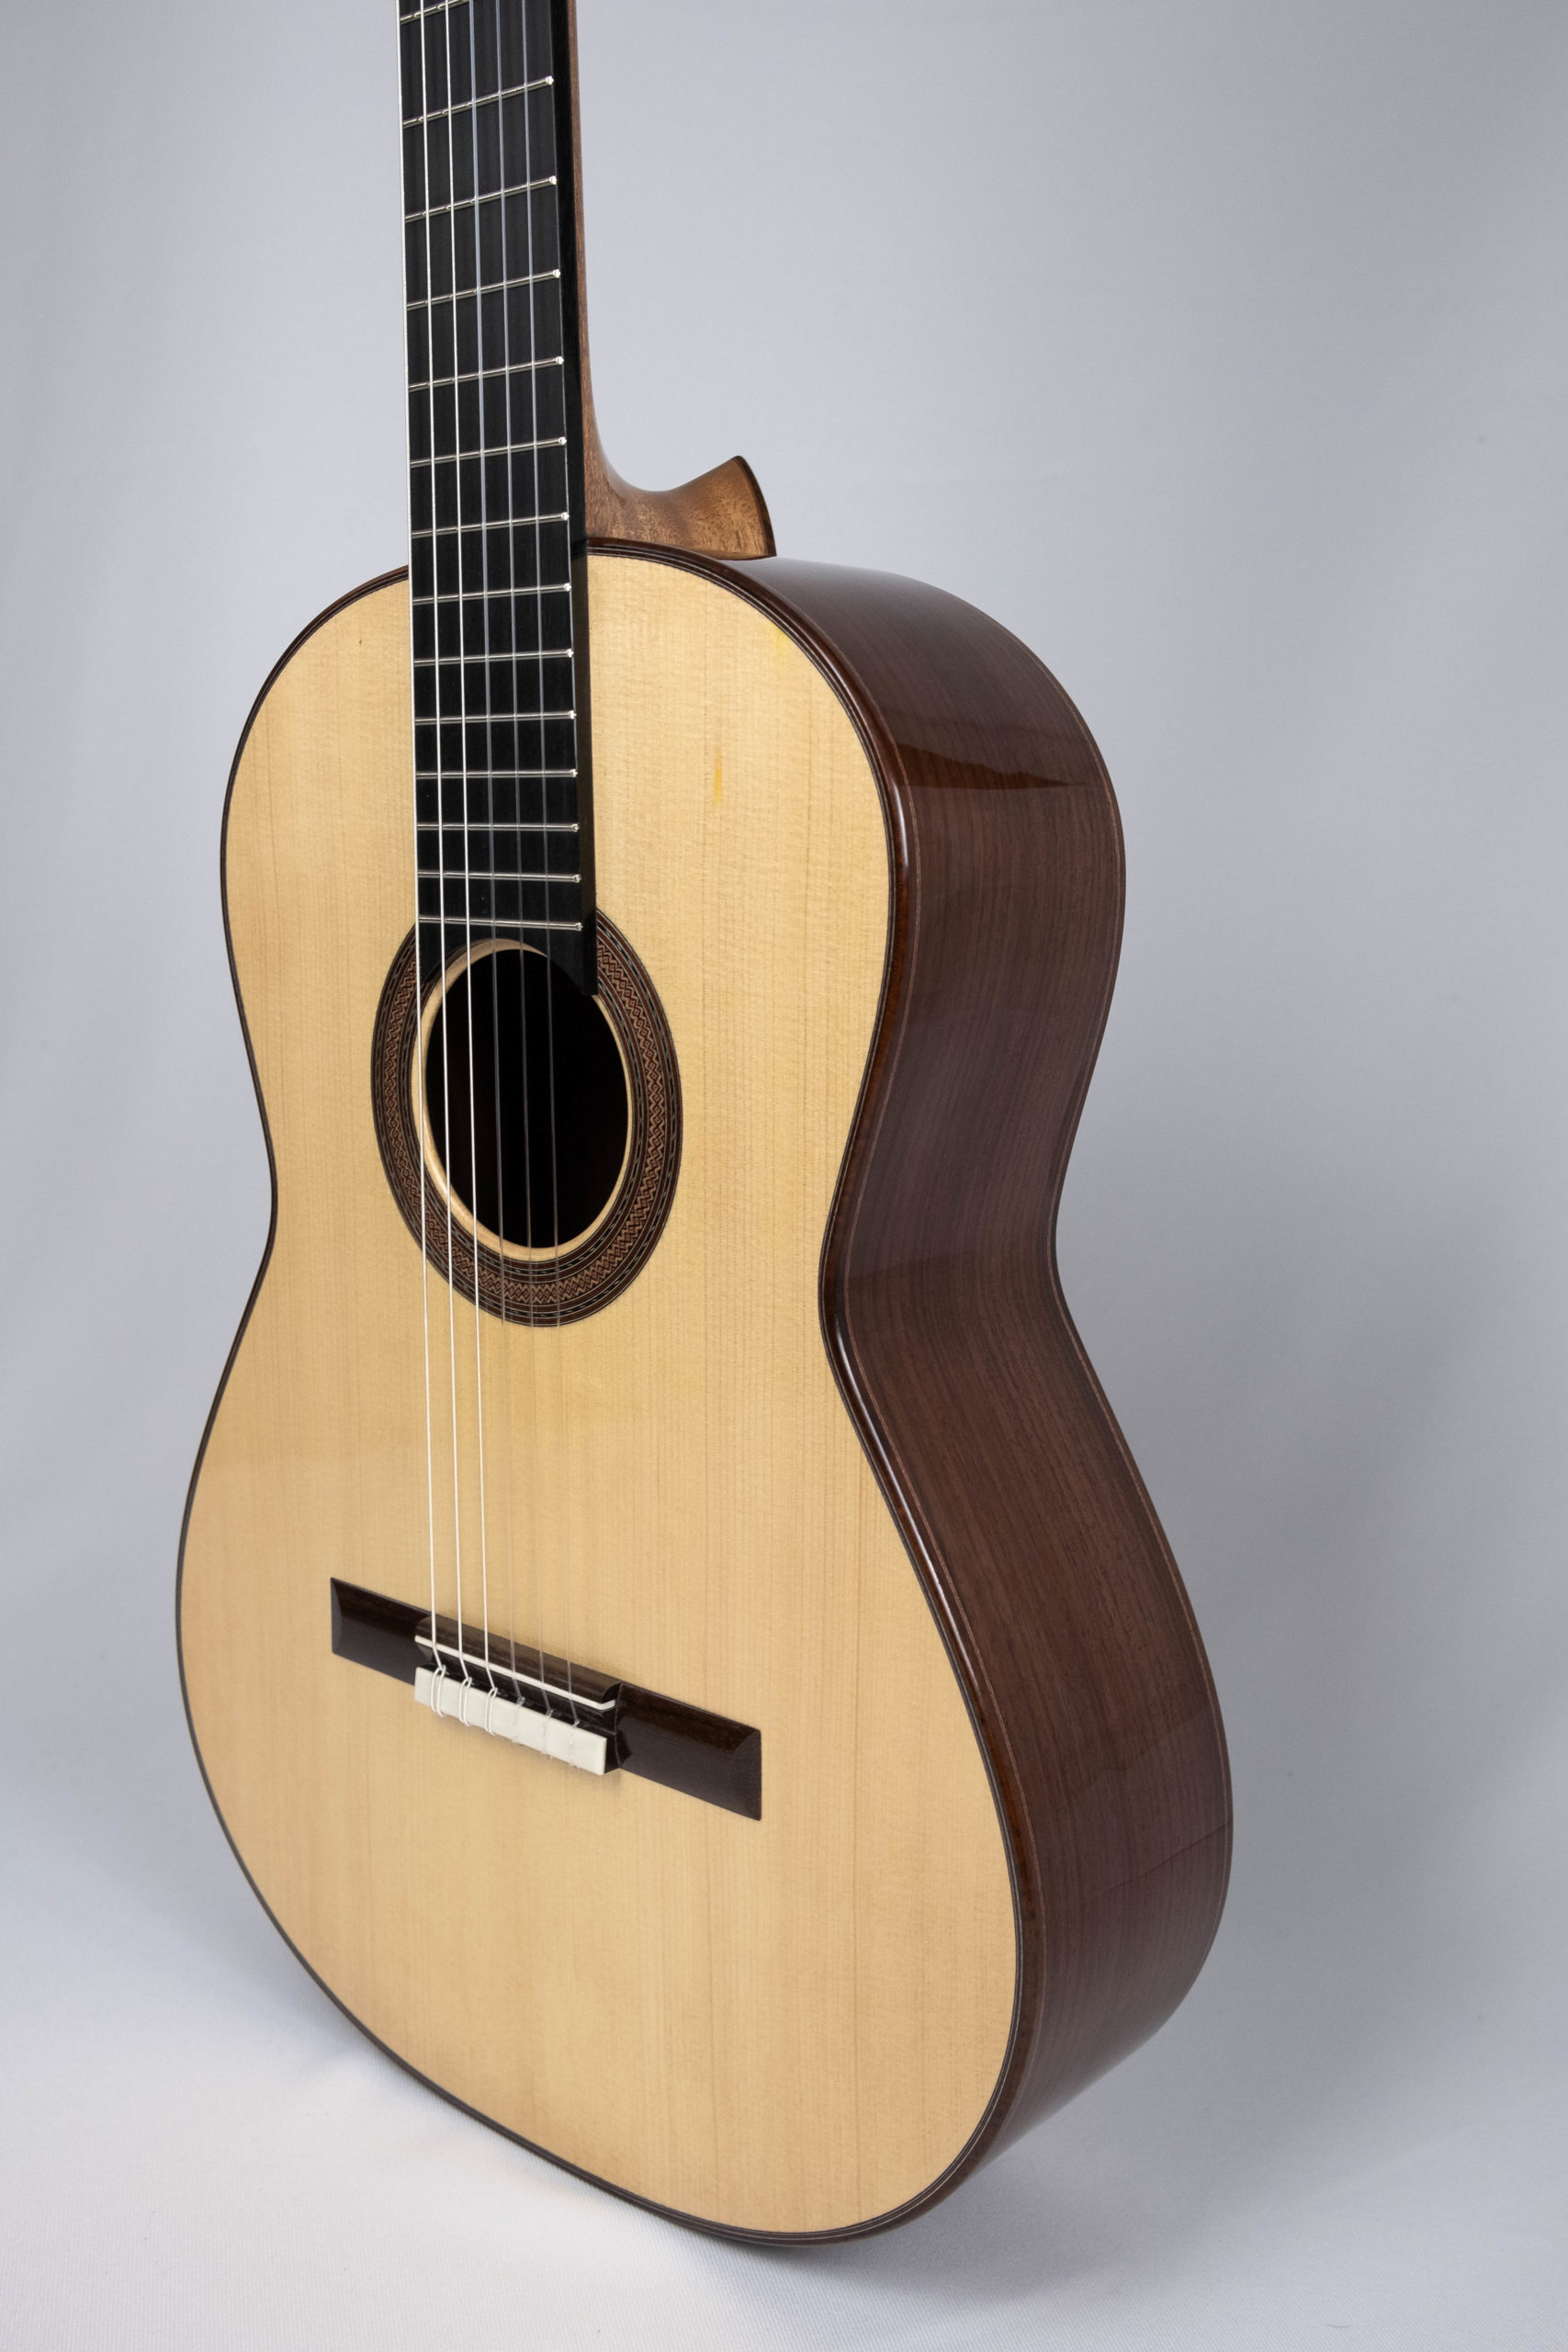 guitares pradel épicéa palissandre 8